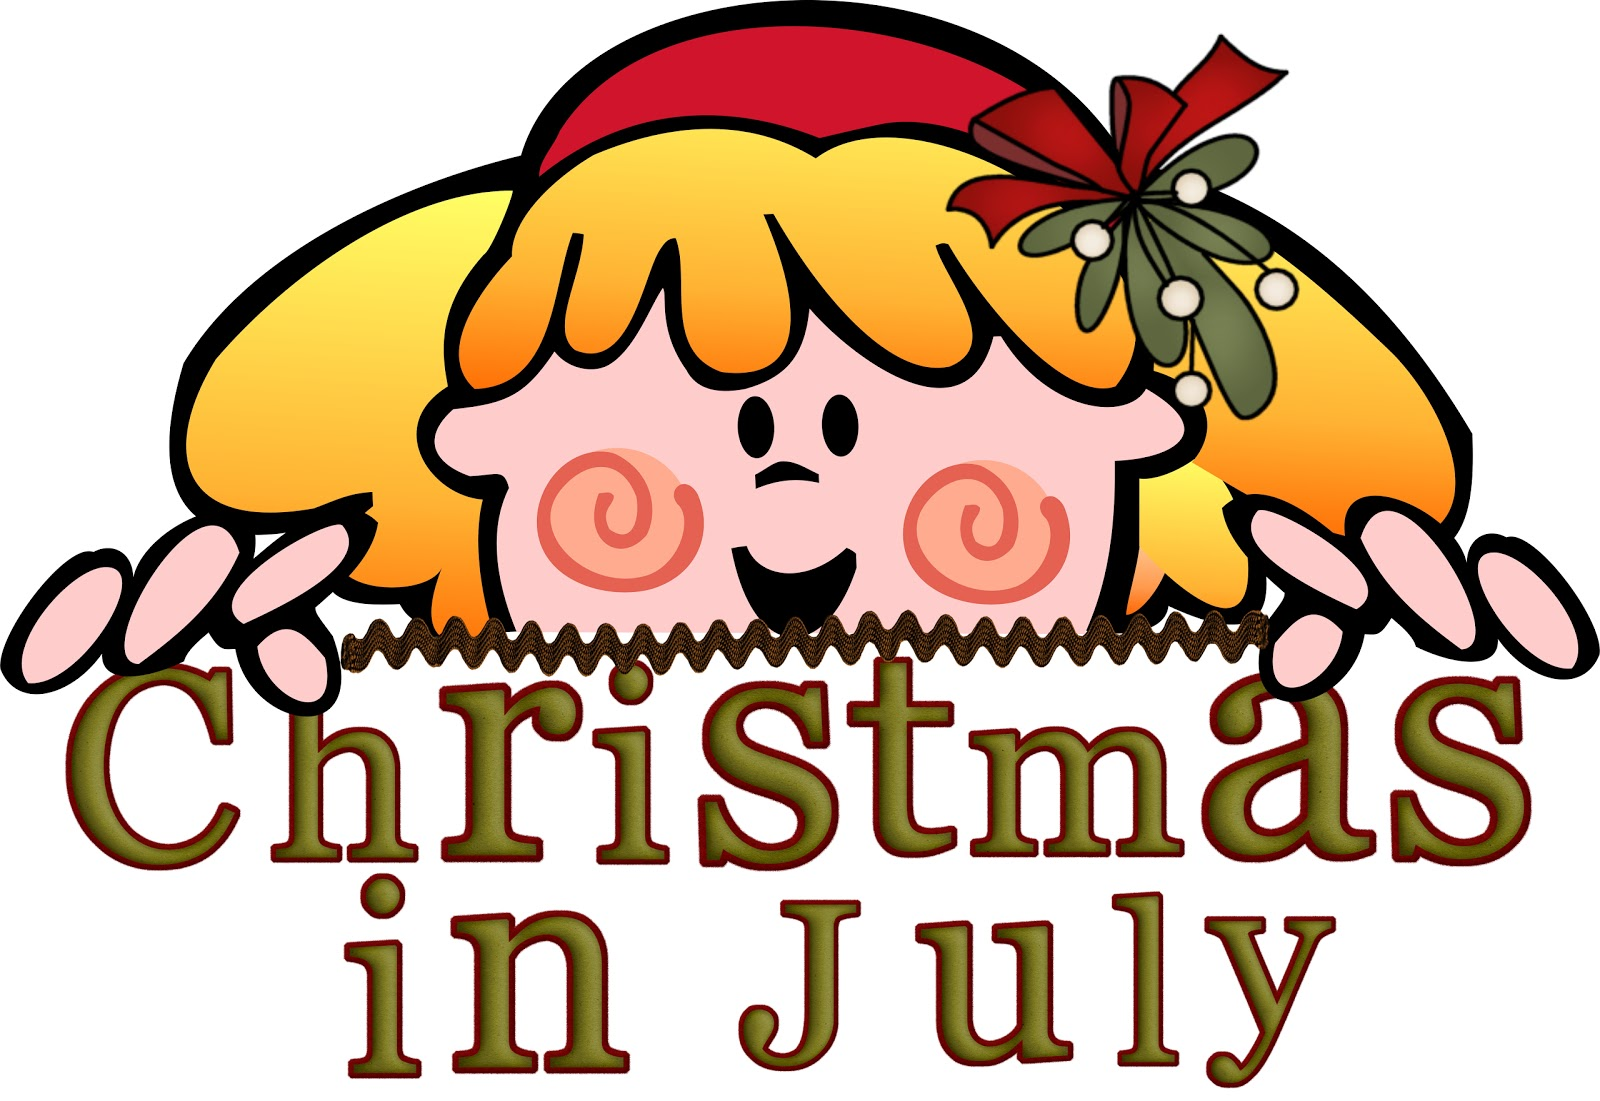 http://3.bp.blogspot.com/-9ORhpibkk8g/ThhpQXHz8XI/AAAAAAAABsk/VJtZMKBD0fM/s1600/christmas+in+july.jpg